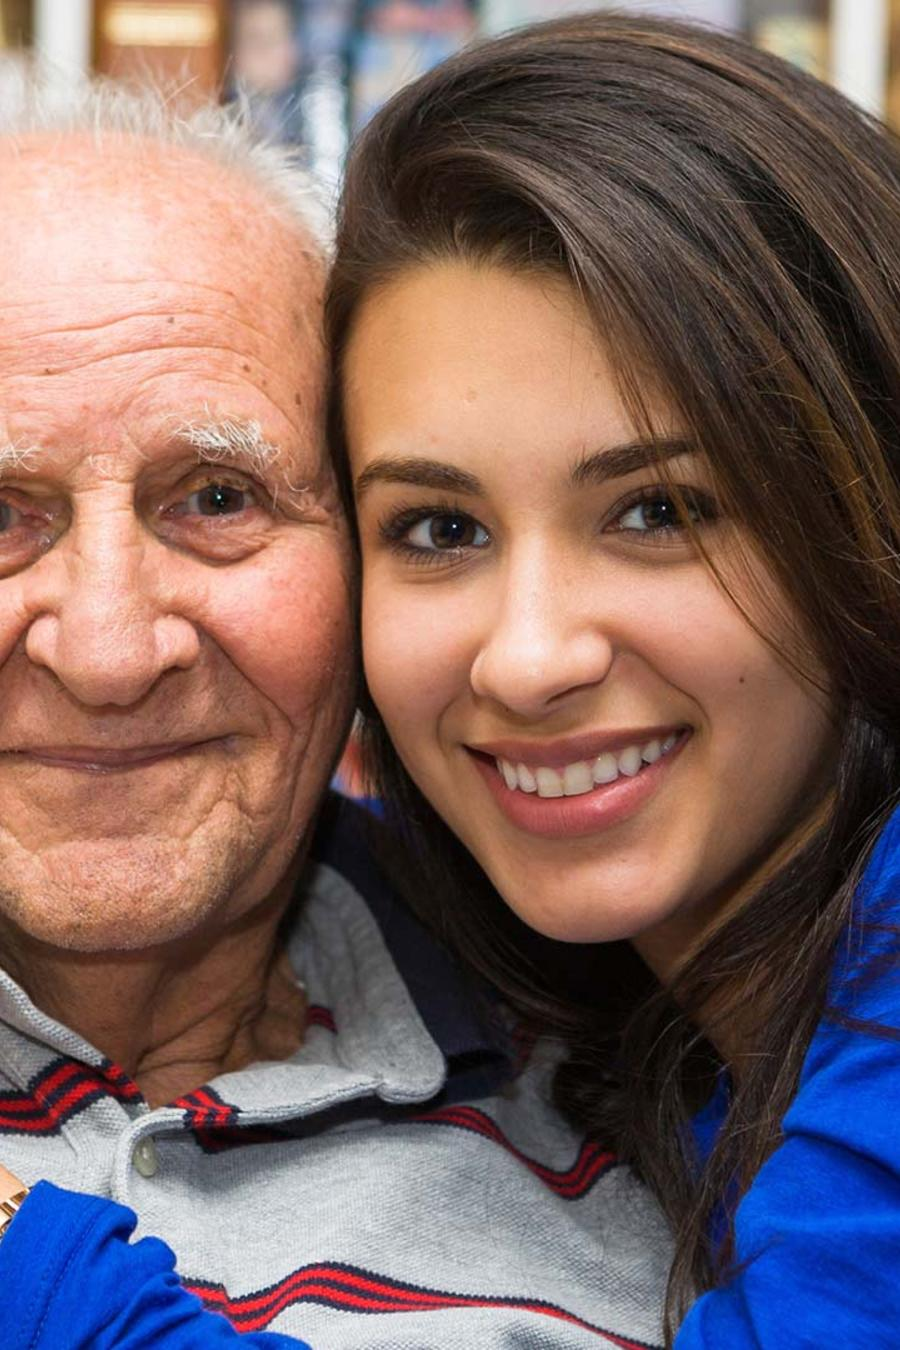 anciano con mujer joven